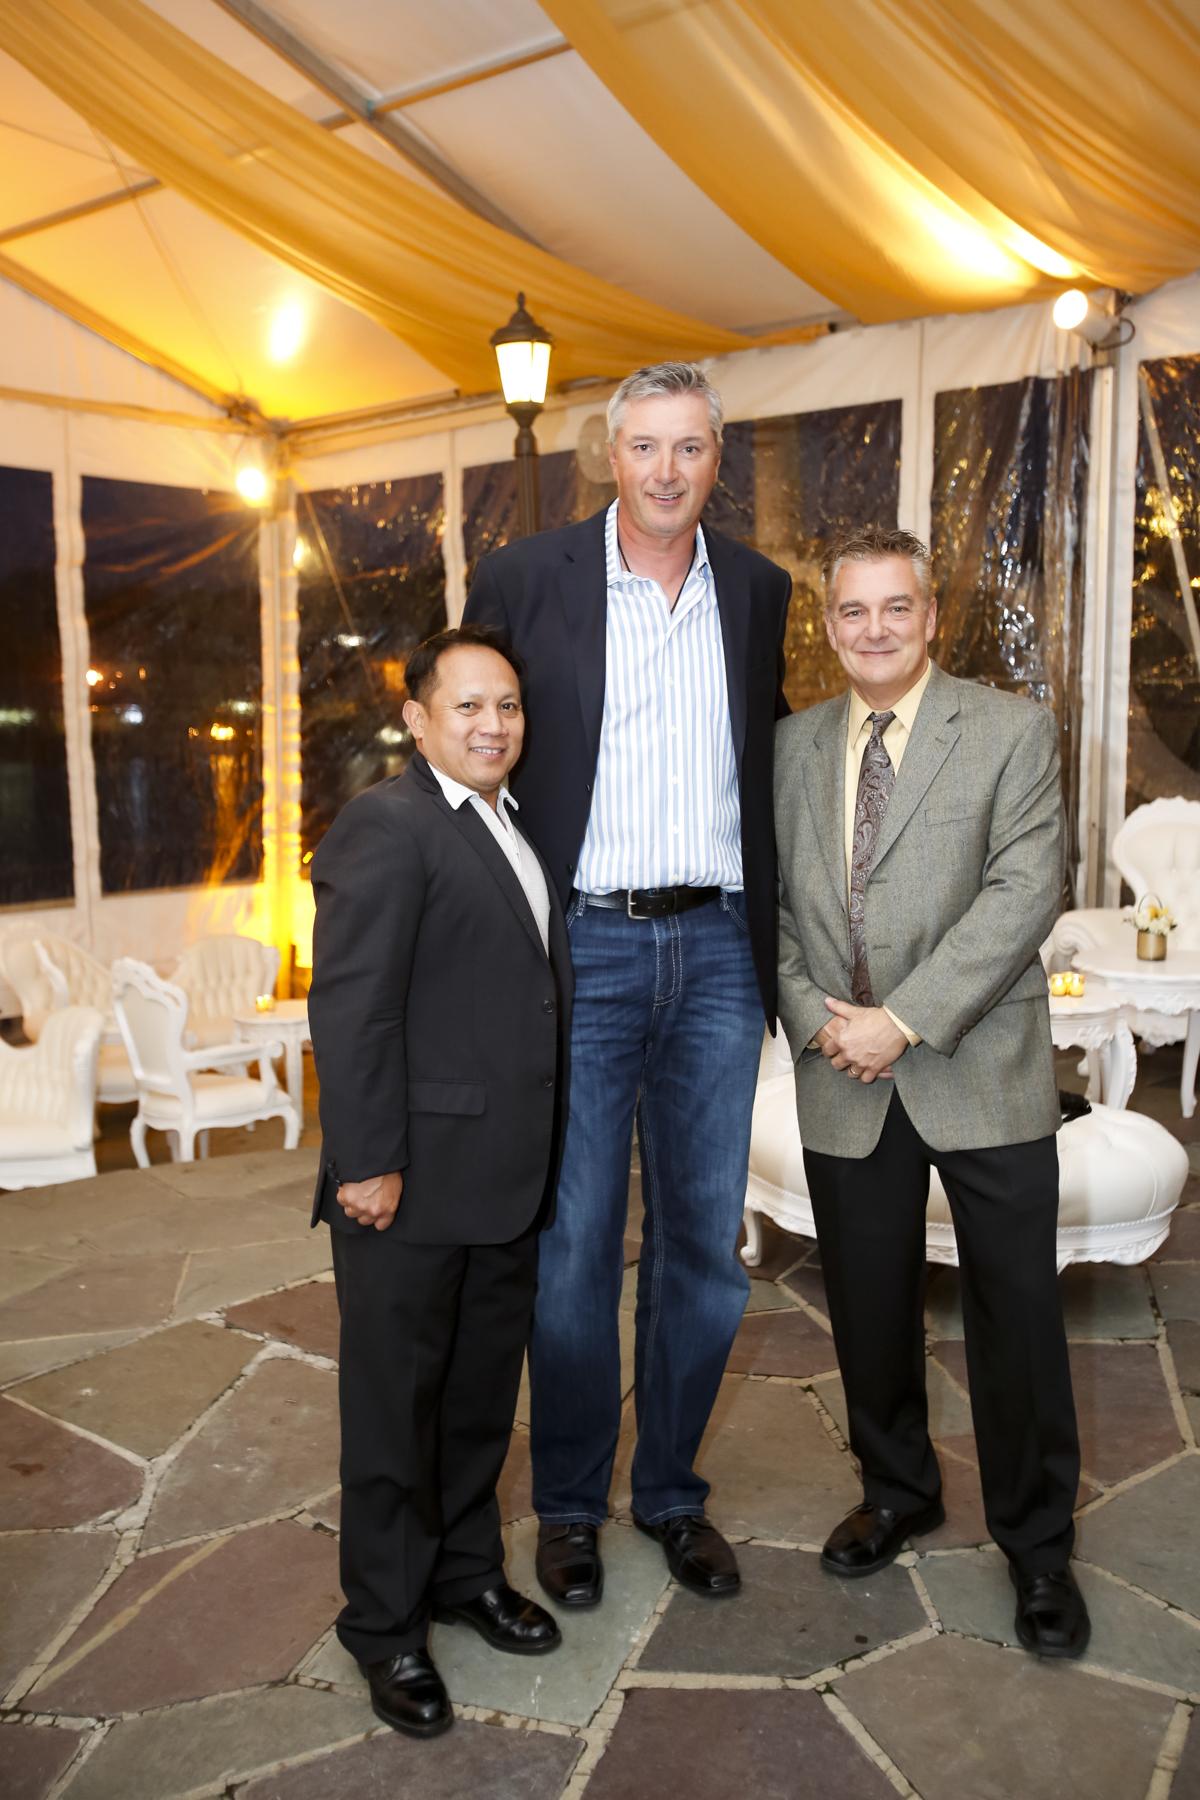 golf-give-gala-celebrity-michael-phelps-jason-day-event-photographer-madison-wi-8.jpg